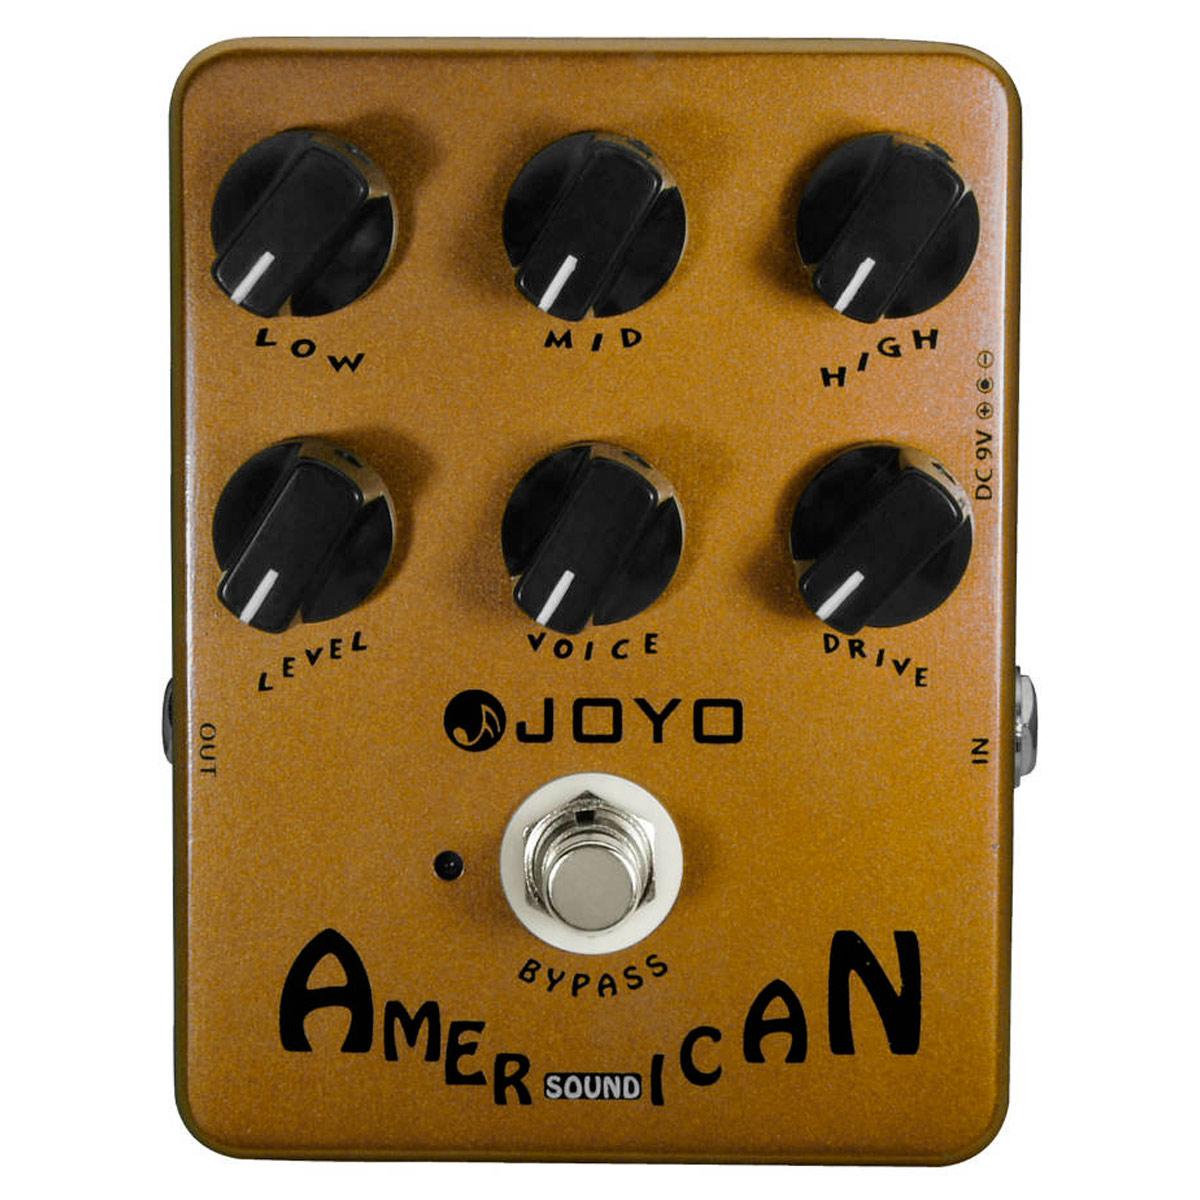 Pedal emulador American Sound p/ Guitarra - JF 14 JOYO